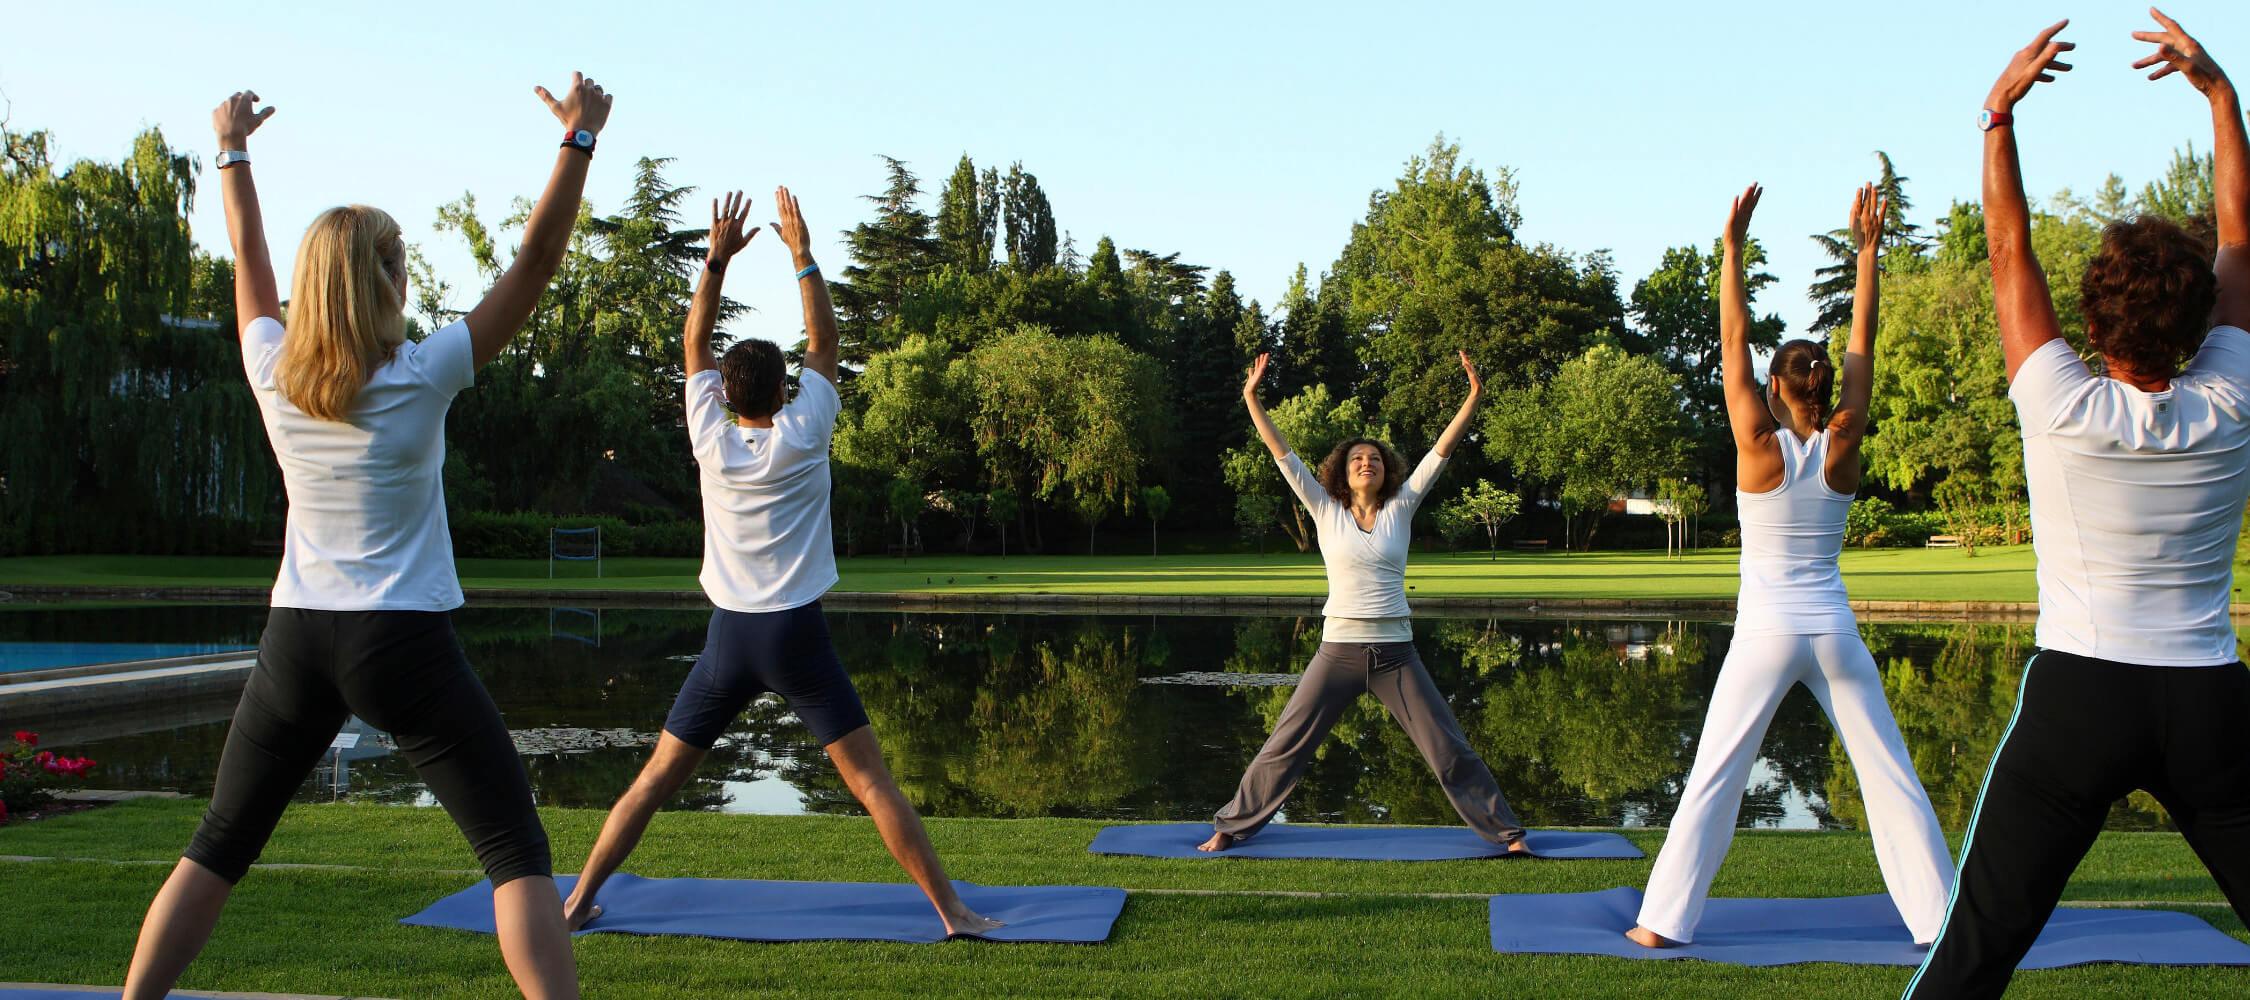 Italien-Trentino_Suedtirol_Alto_Adige_Merano_Meran_Sport_Fitness_Yoga_Therme_Park_Wellness_Balance_Therme-Meran-Mario-Entero_mgm00309maen_2250x1000